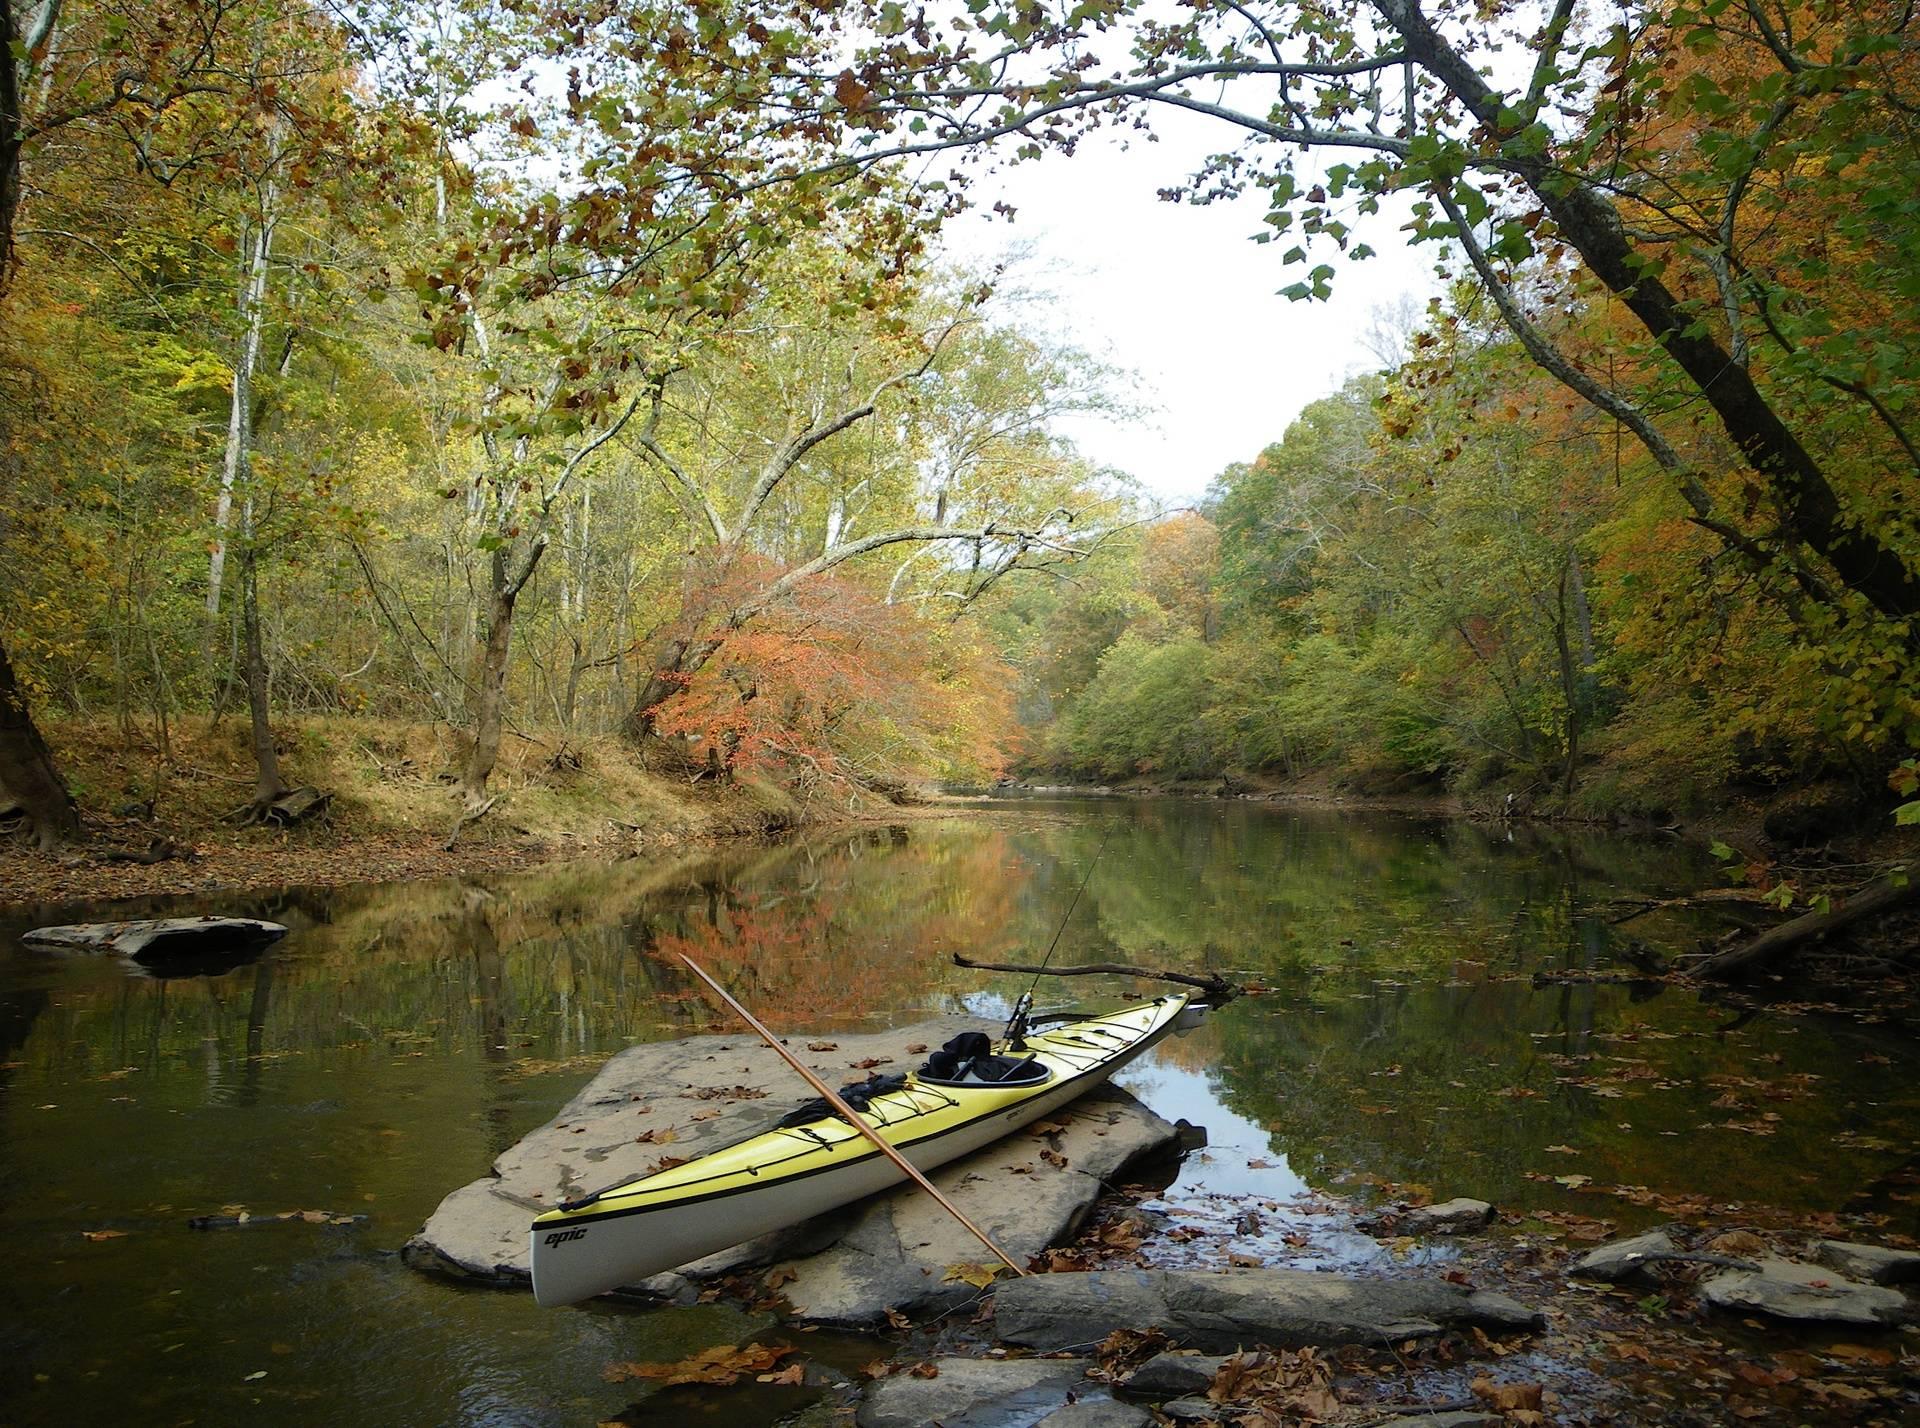 Bull Run Creek in Virginia